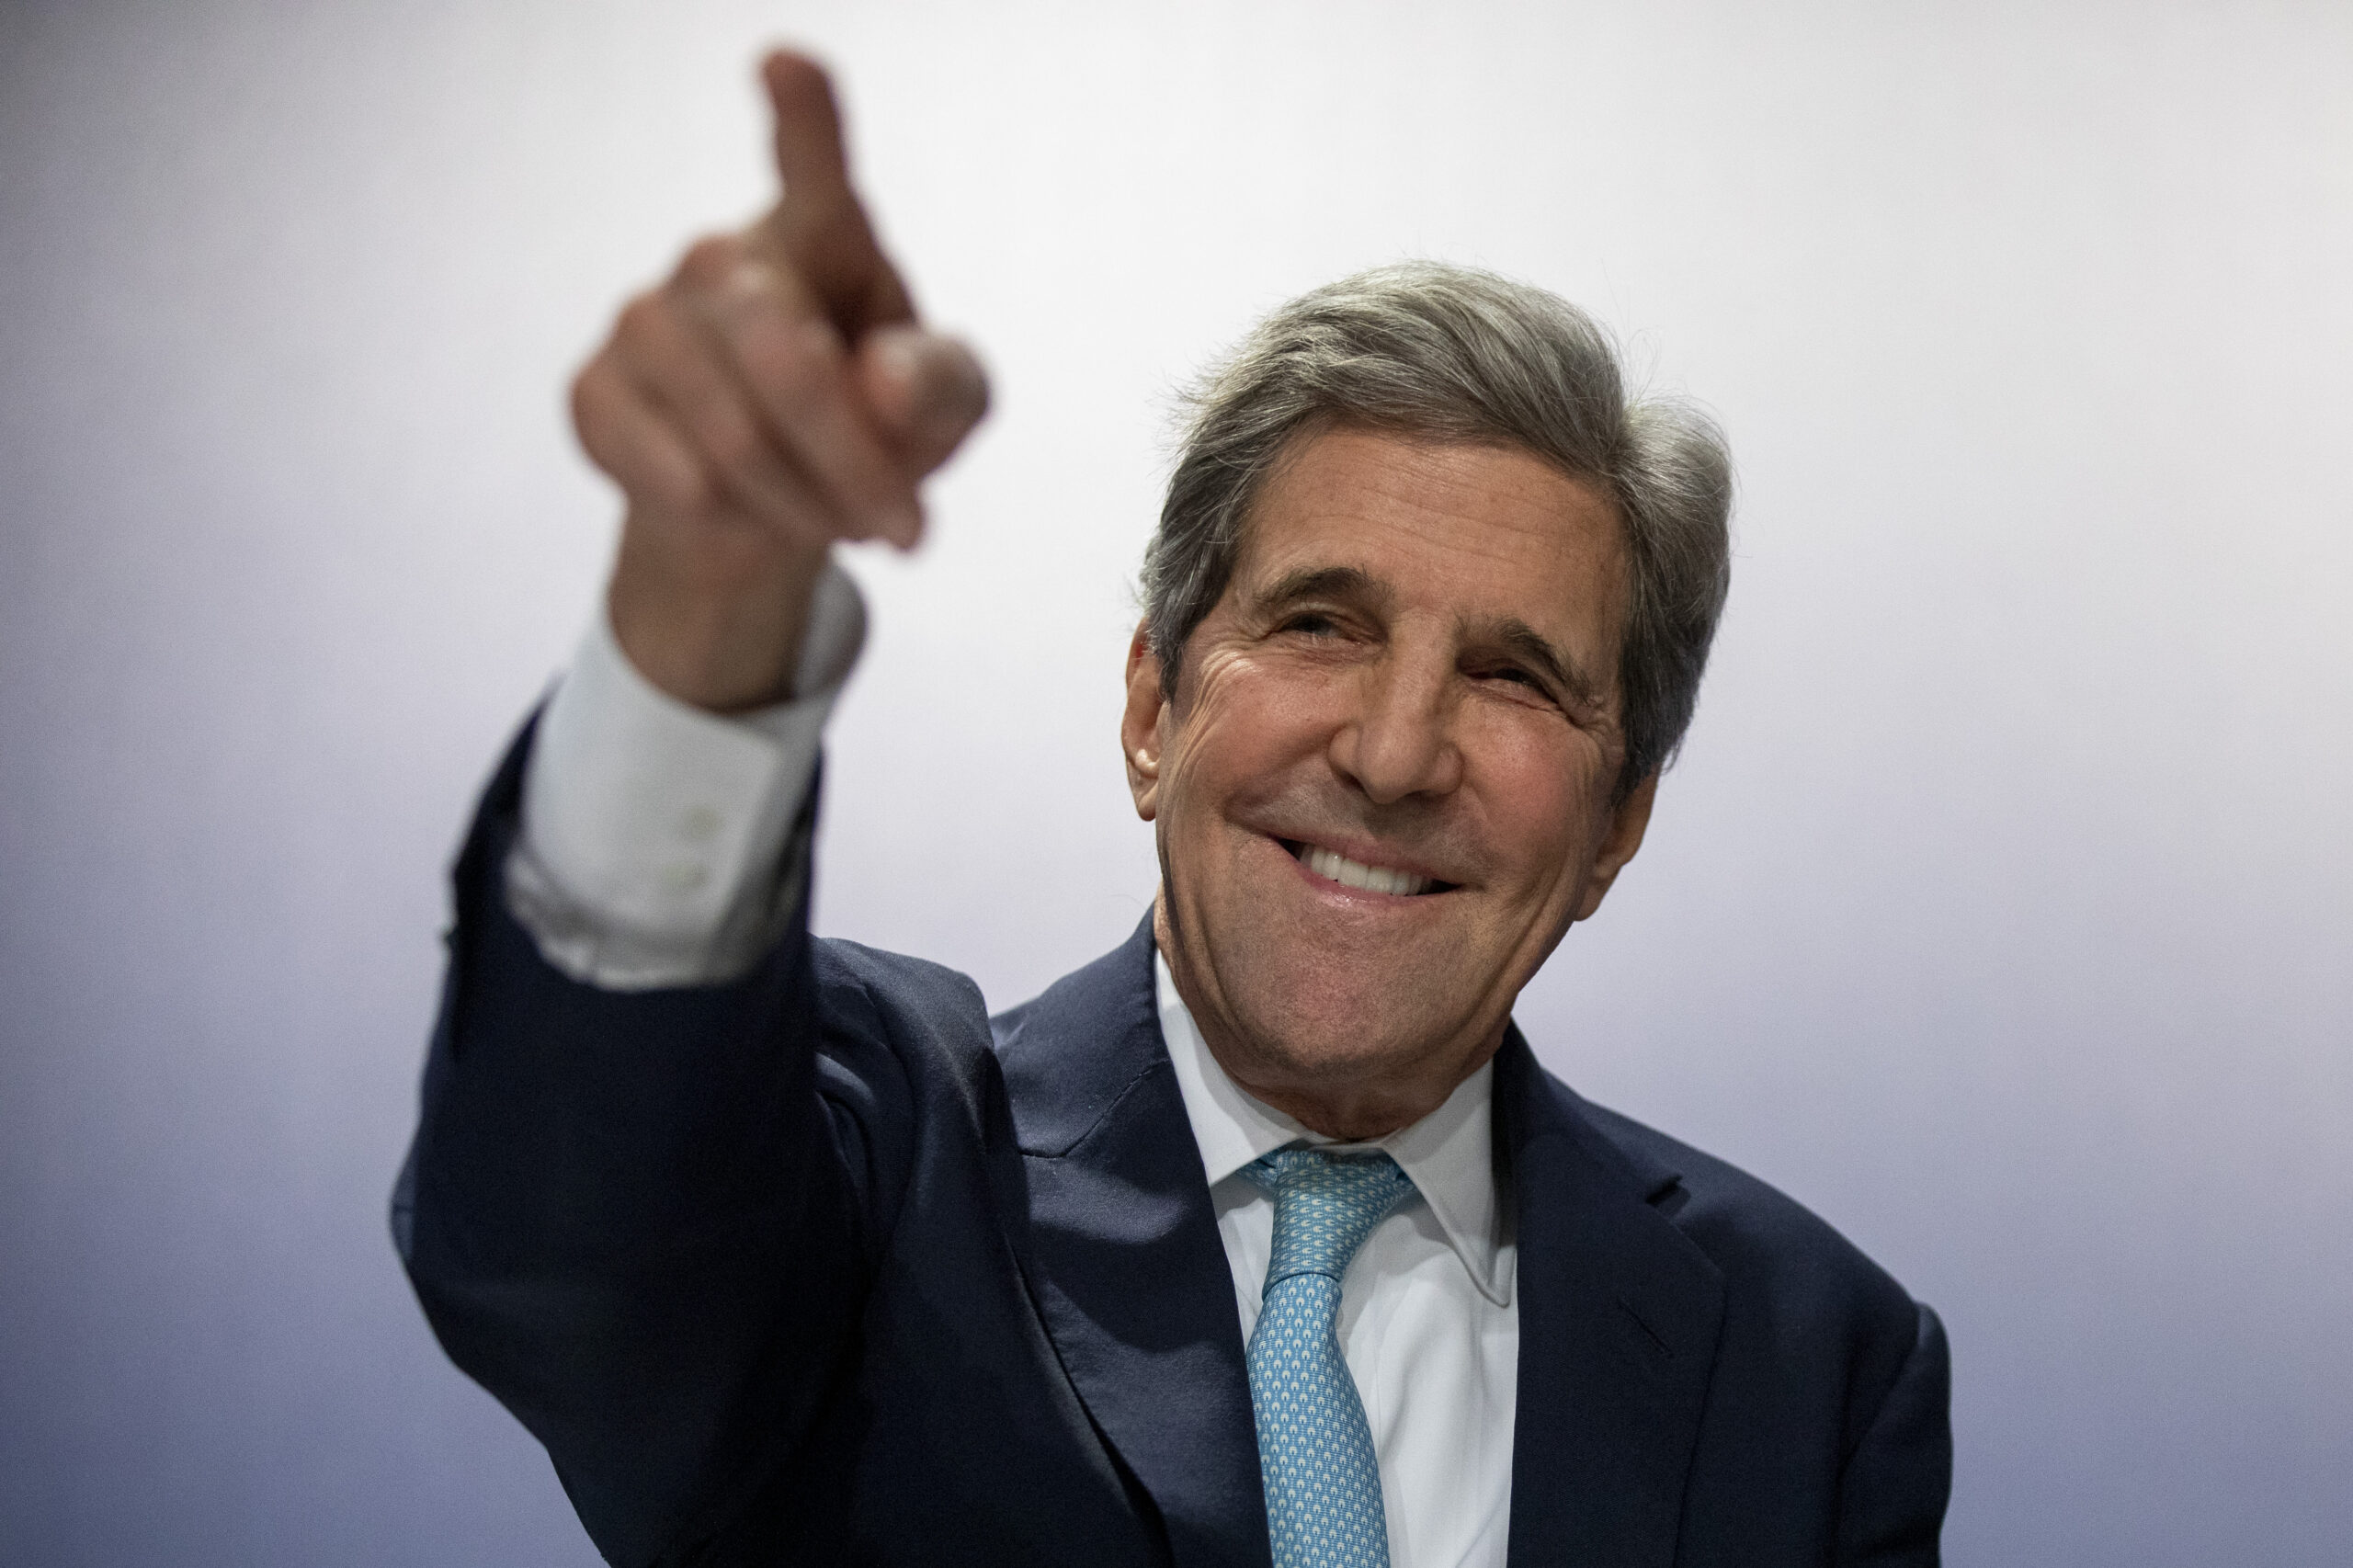 Joe Biden Announces John Kerry as New 'Climate Czar,' Will Sit on National Security Council